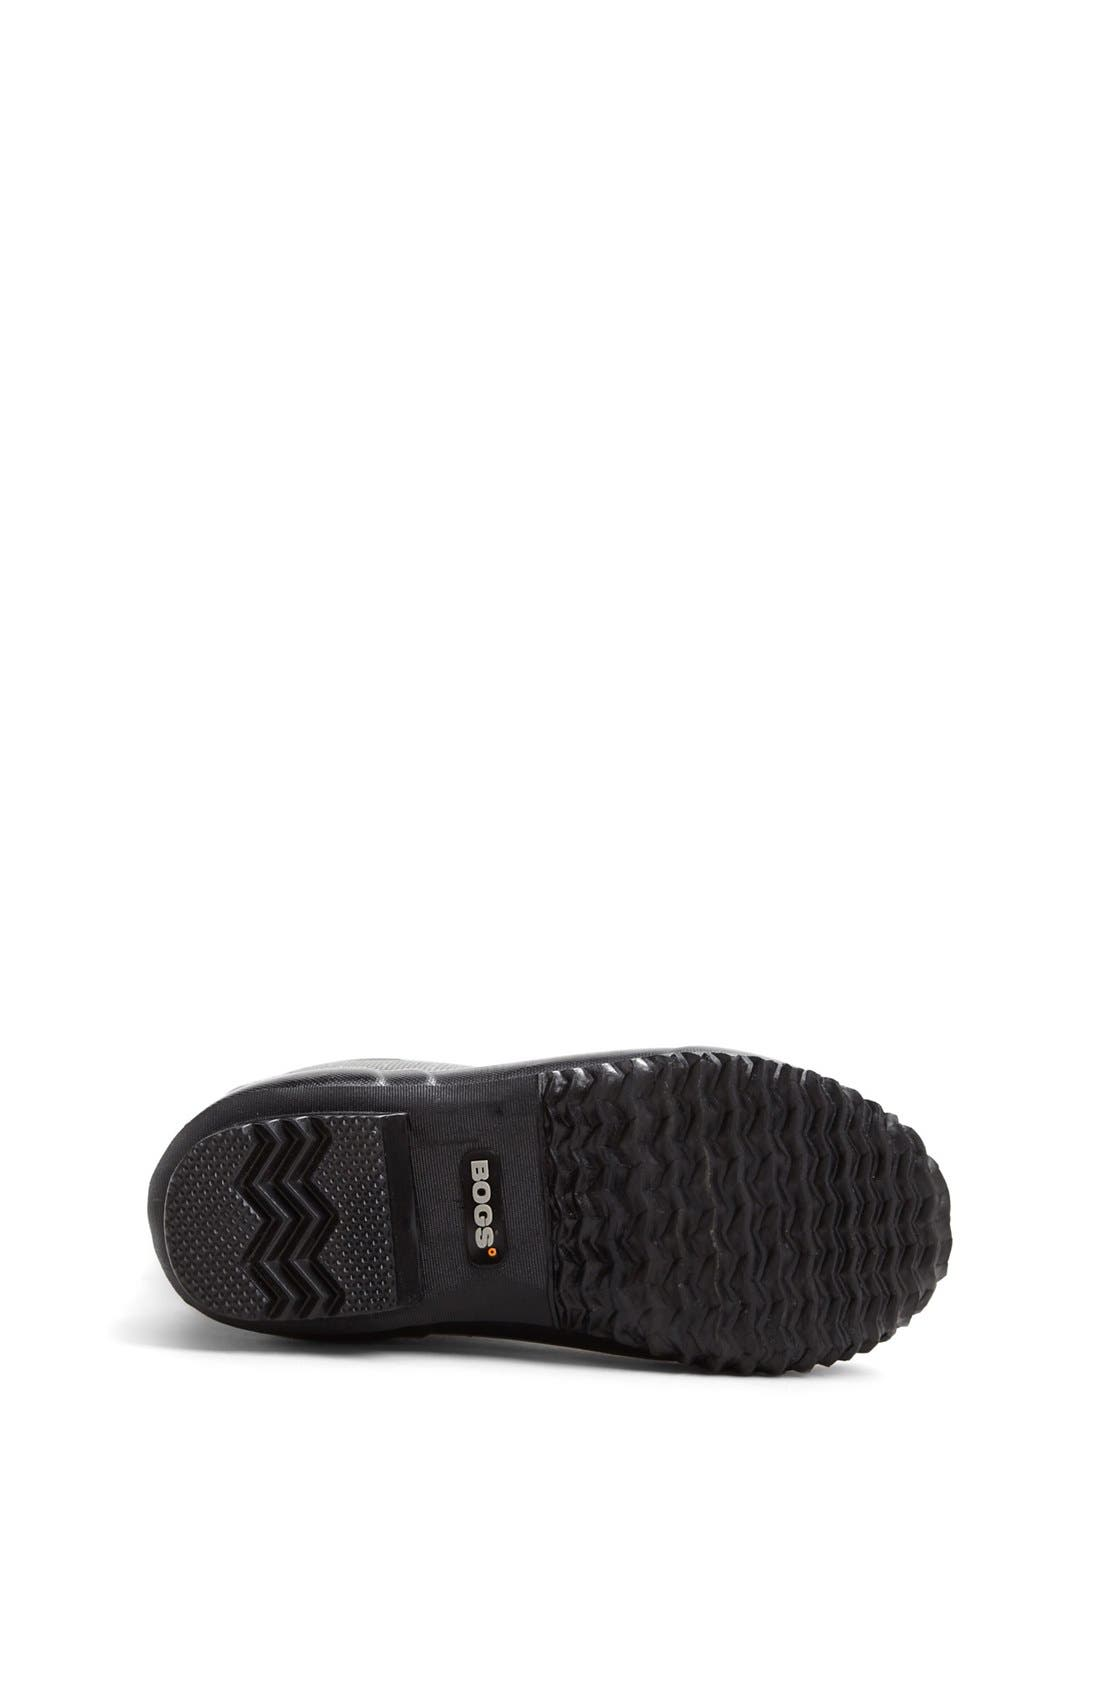 Alternate Image 4  - Bogs Footwear 'Plimsoll' Boot (Little Kid & Big Kid)